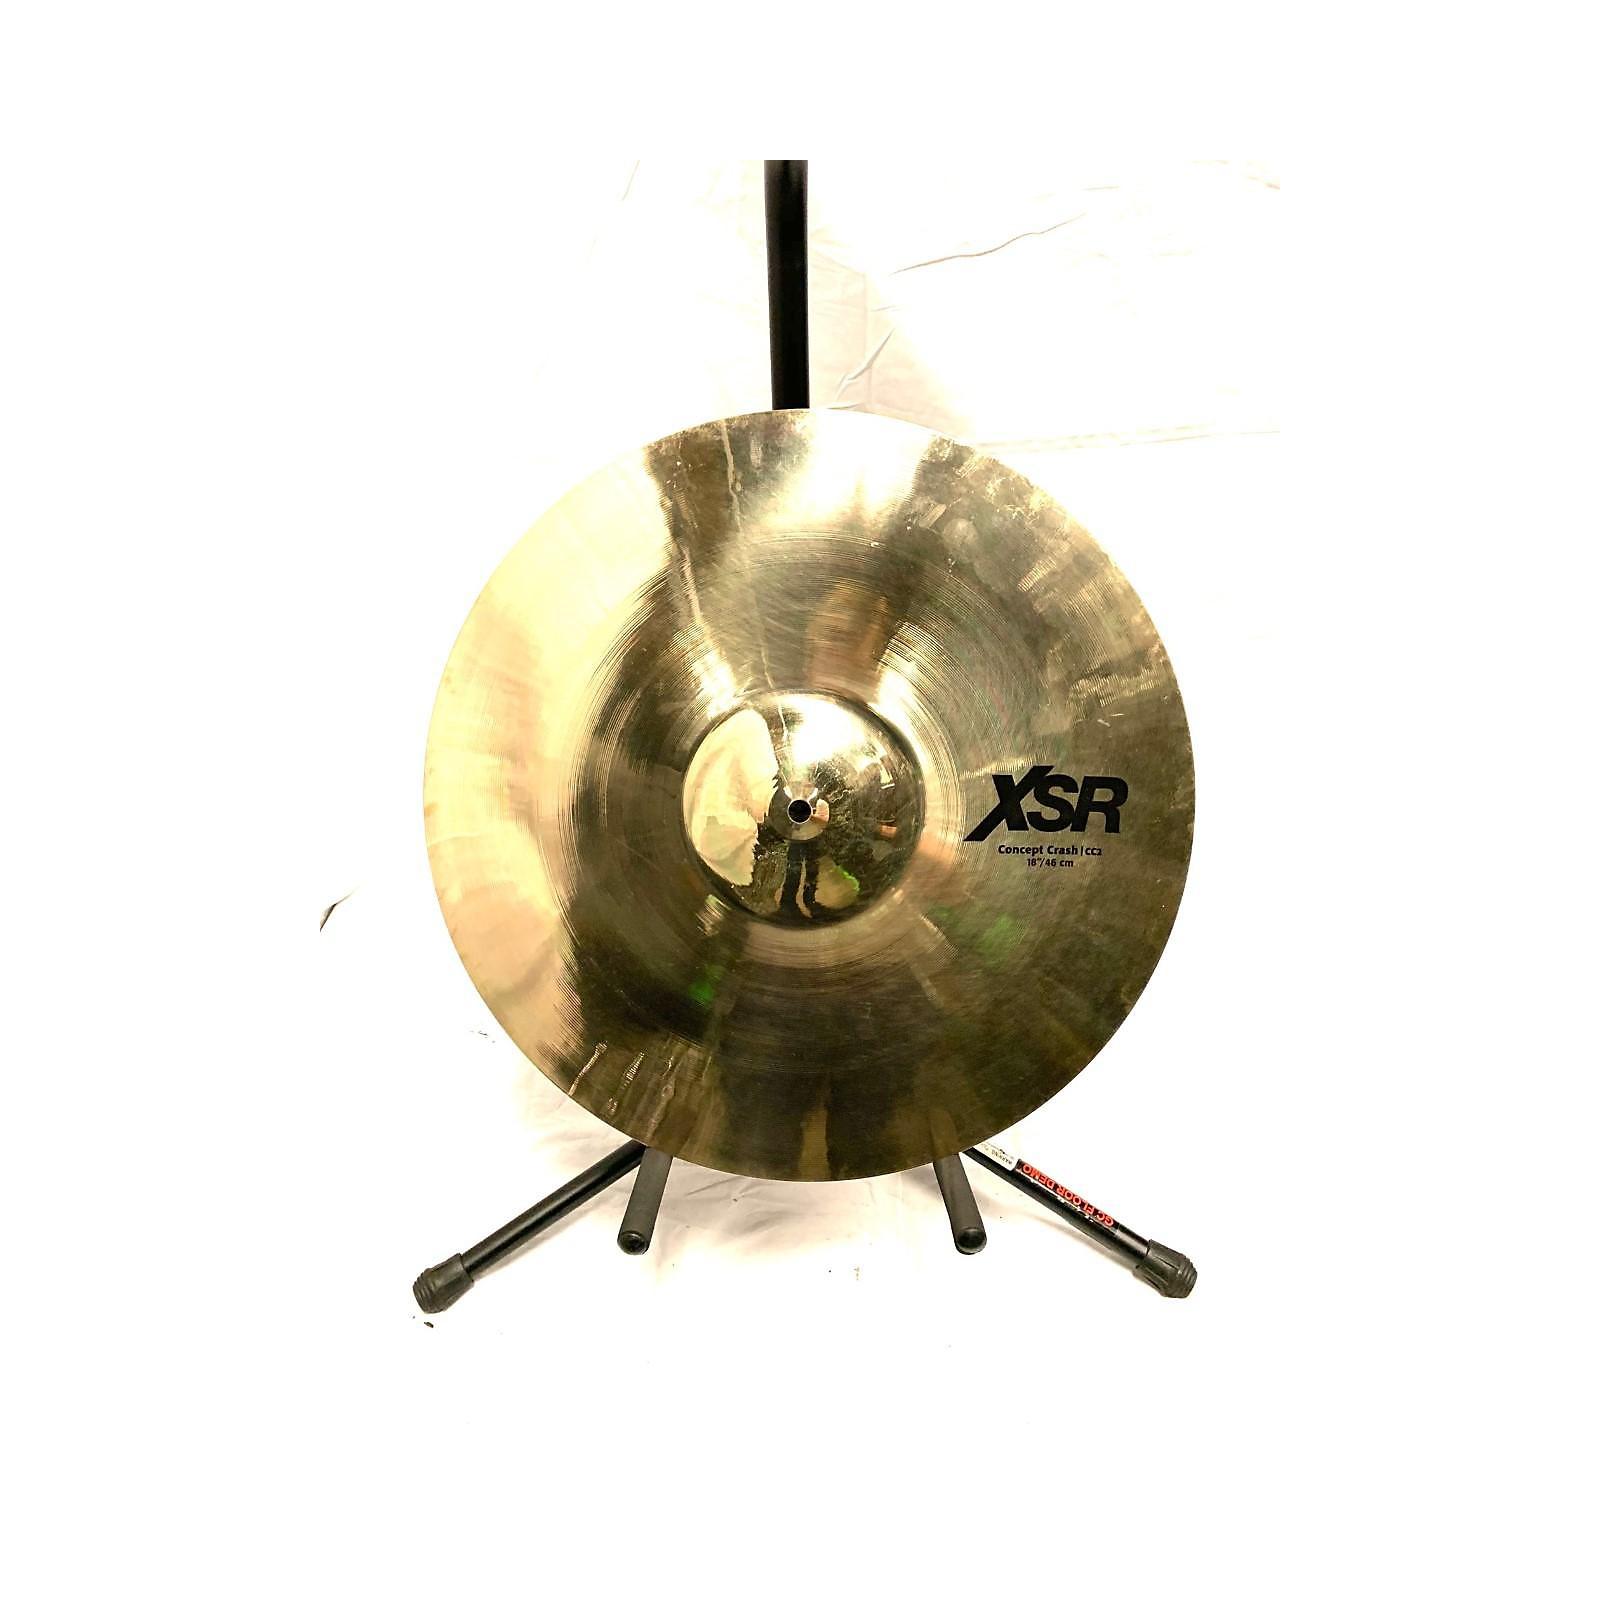 Sabian 18in XSR Concept Crash Cymbal